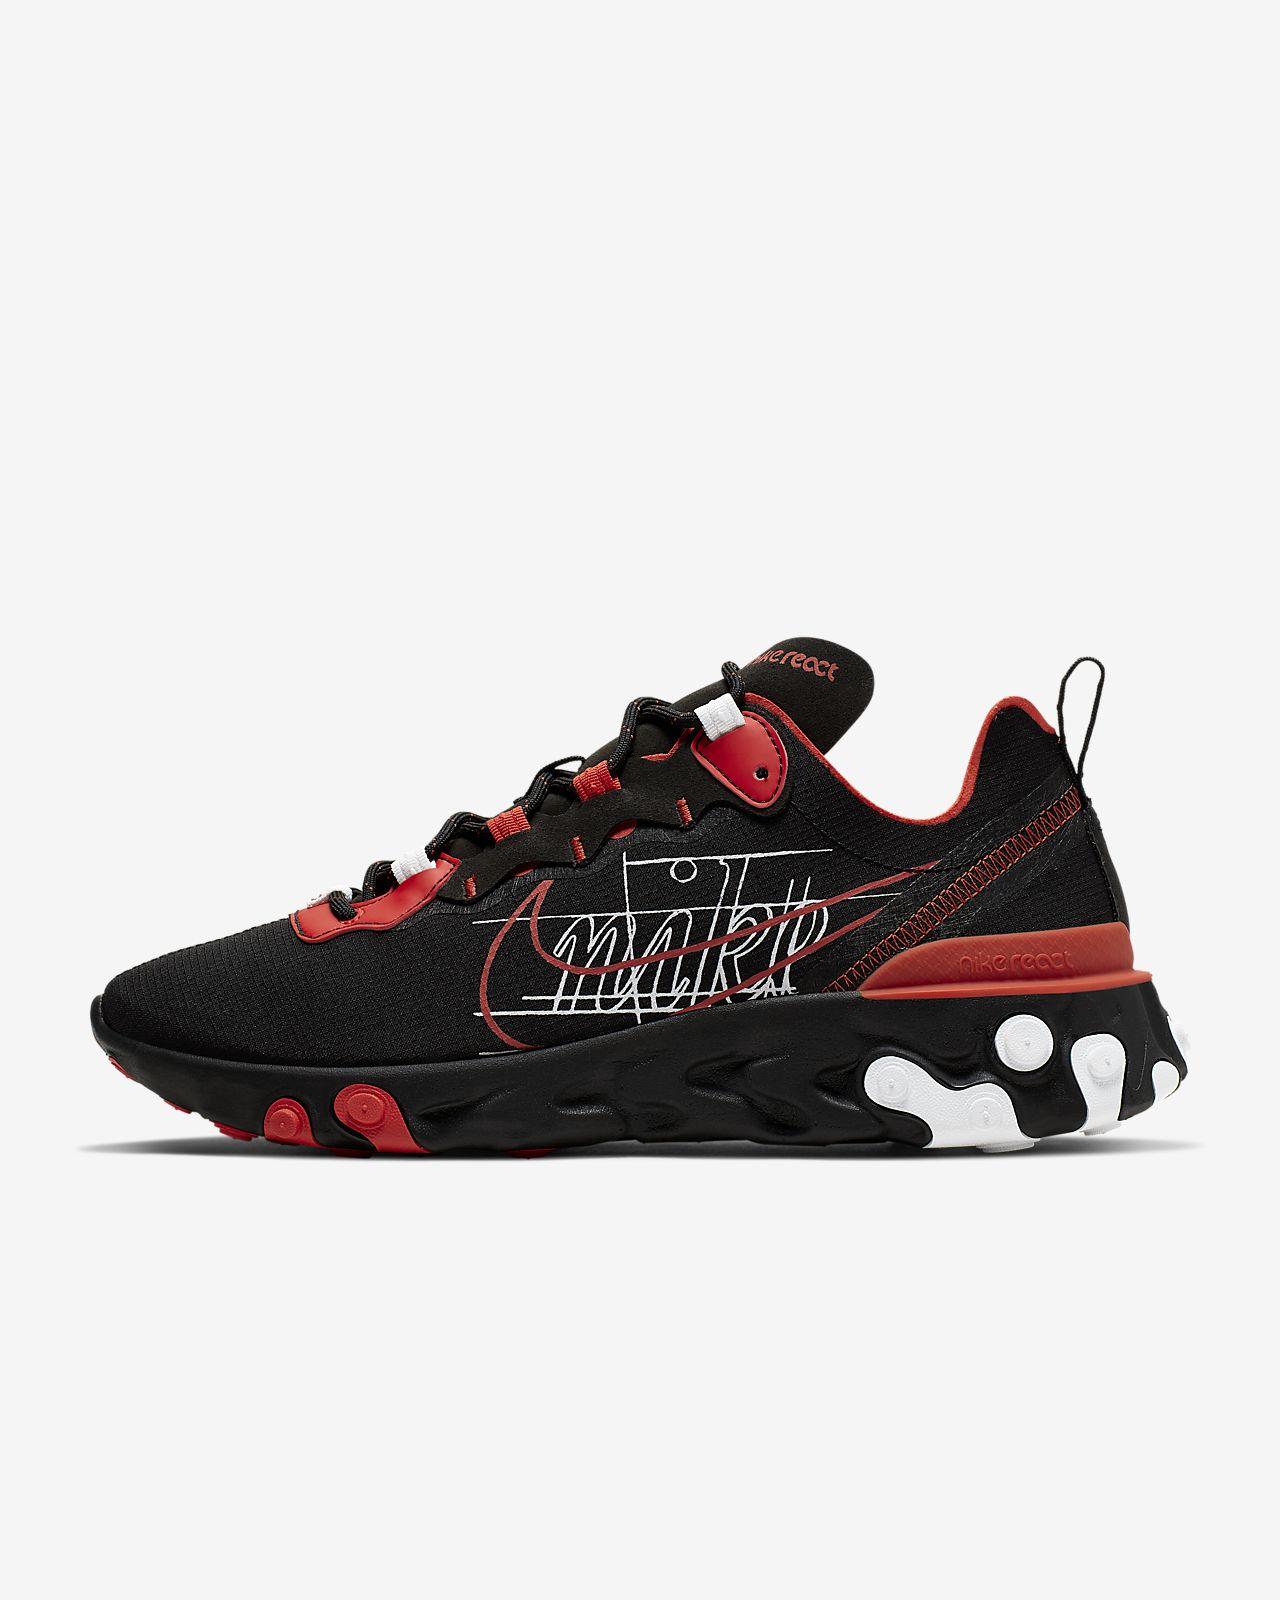 Nike React Pour Homme Chaussure 55 Element UqpzMVS